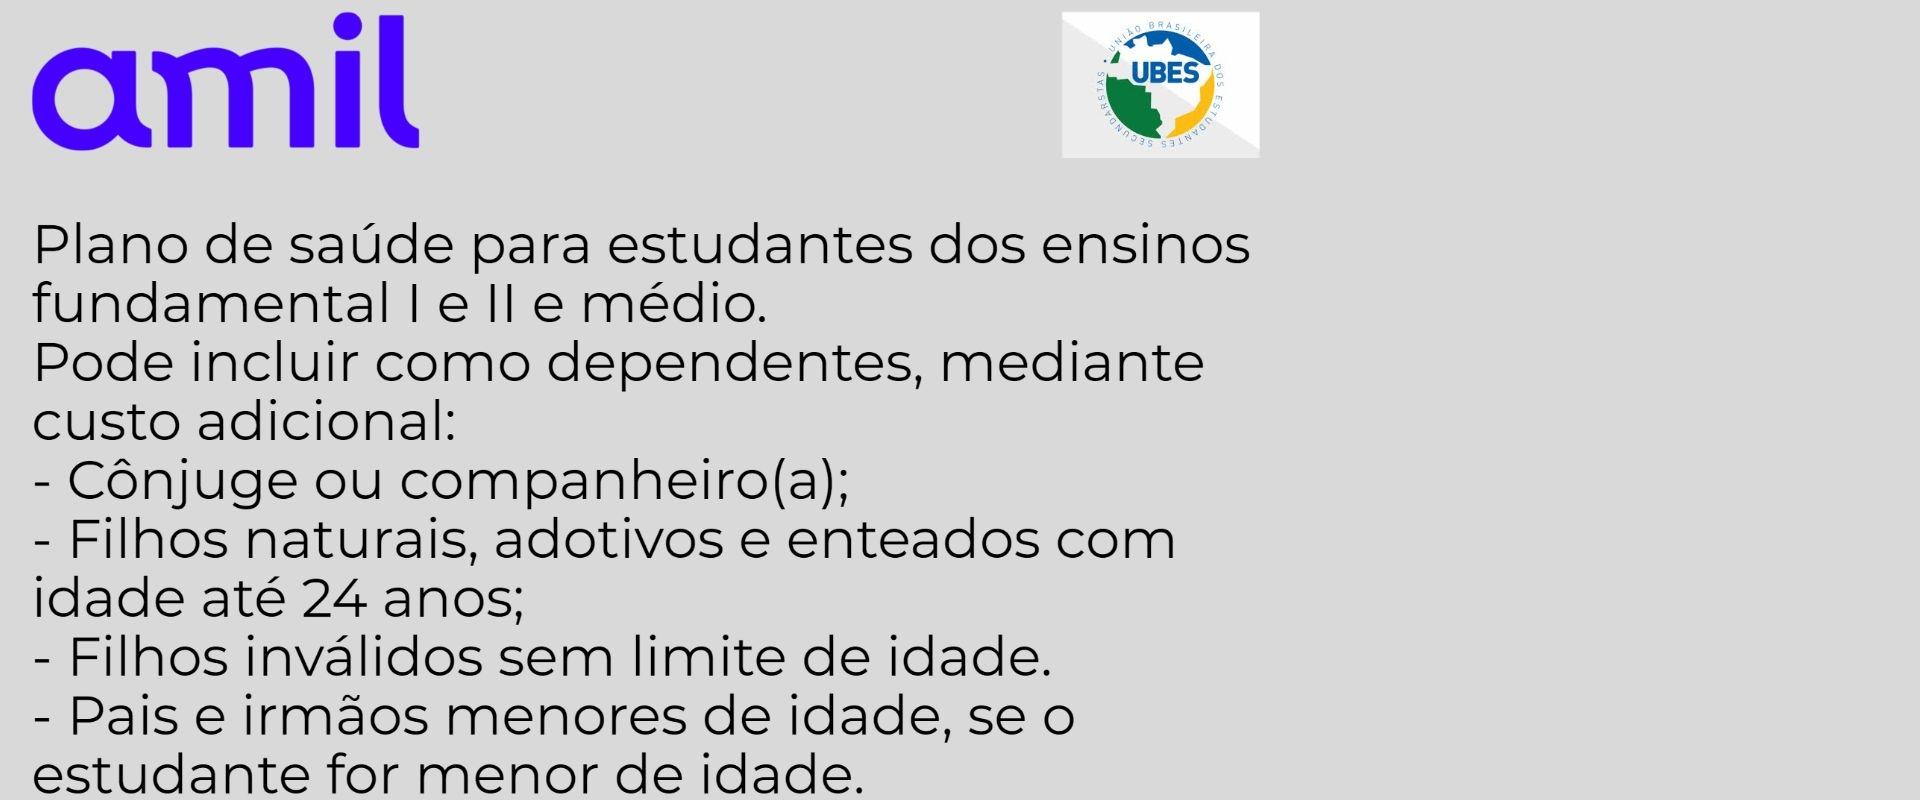 Amil UBES-AL